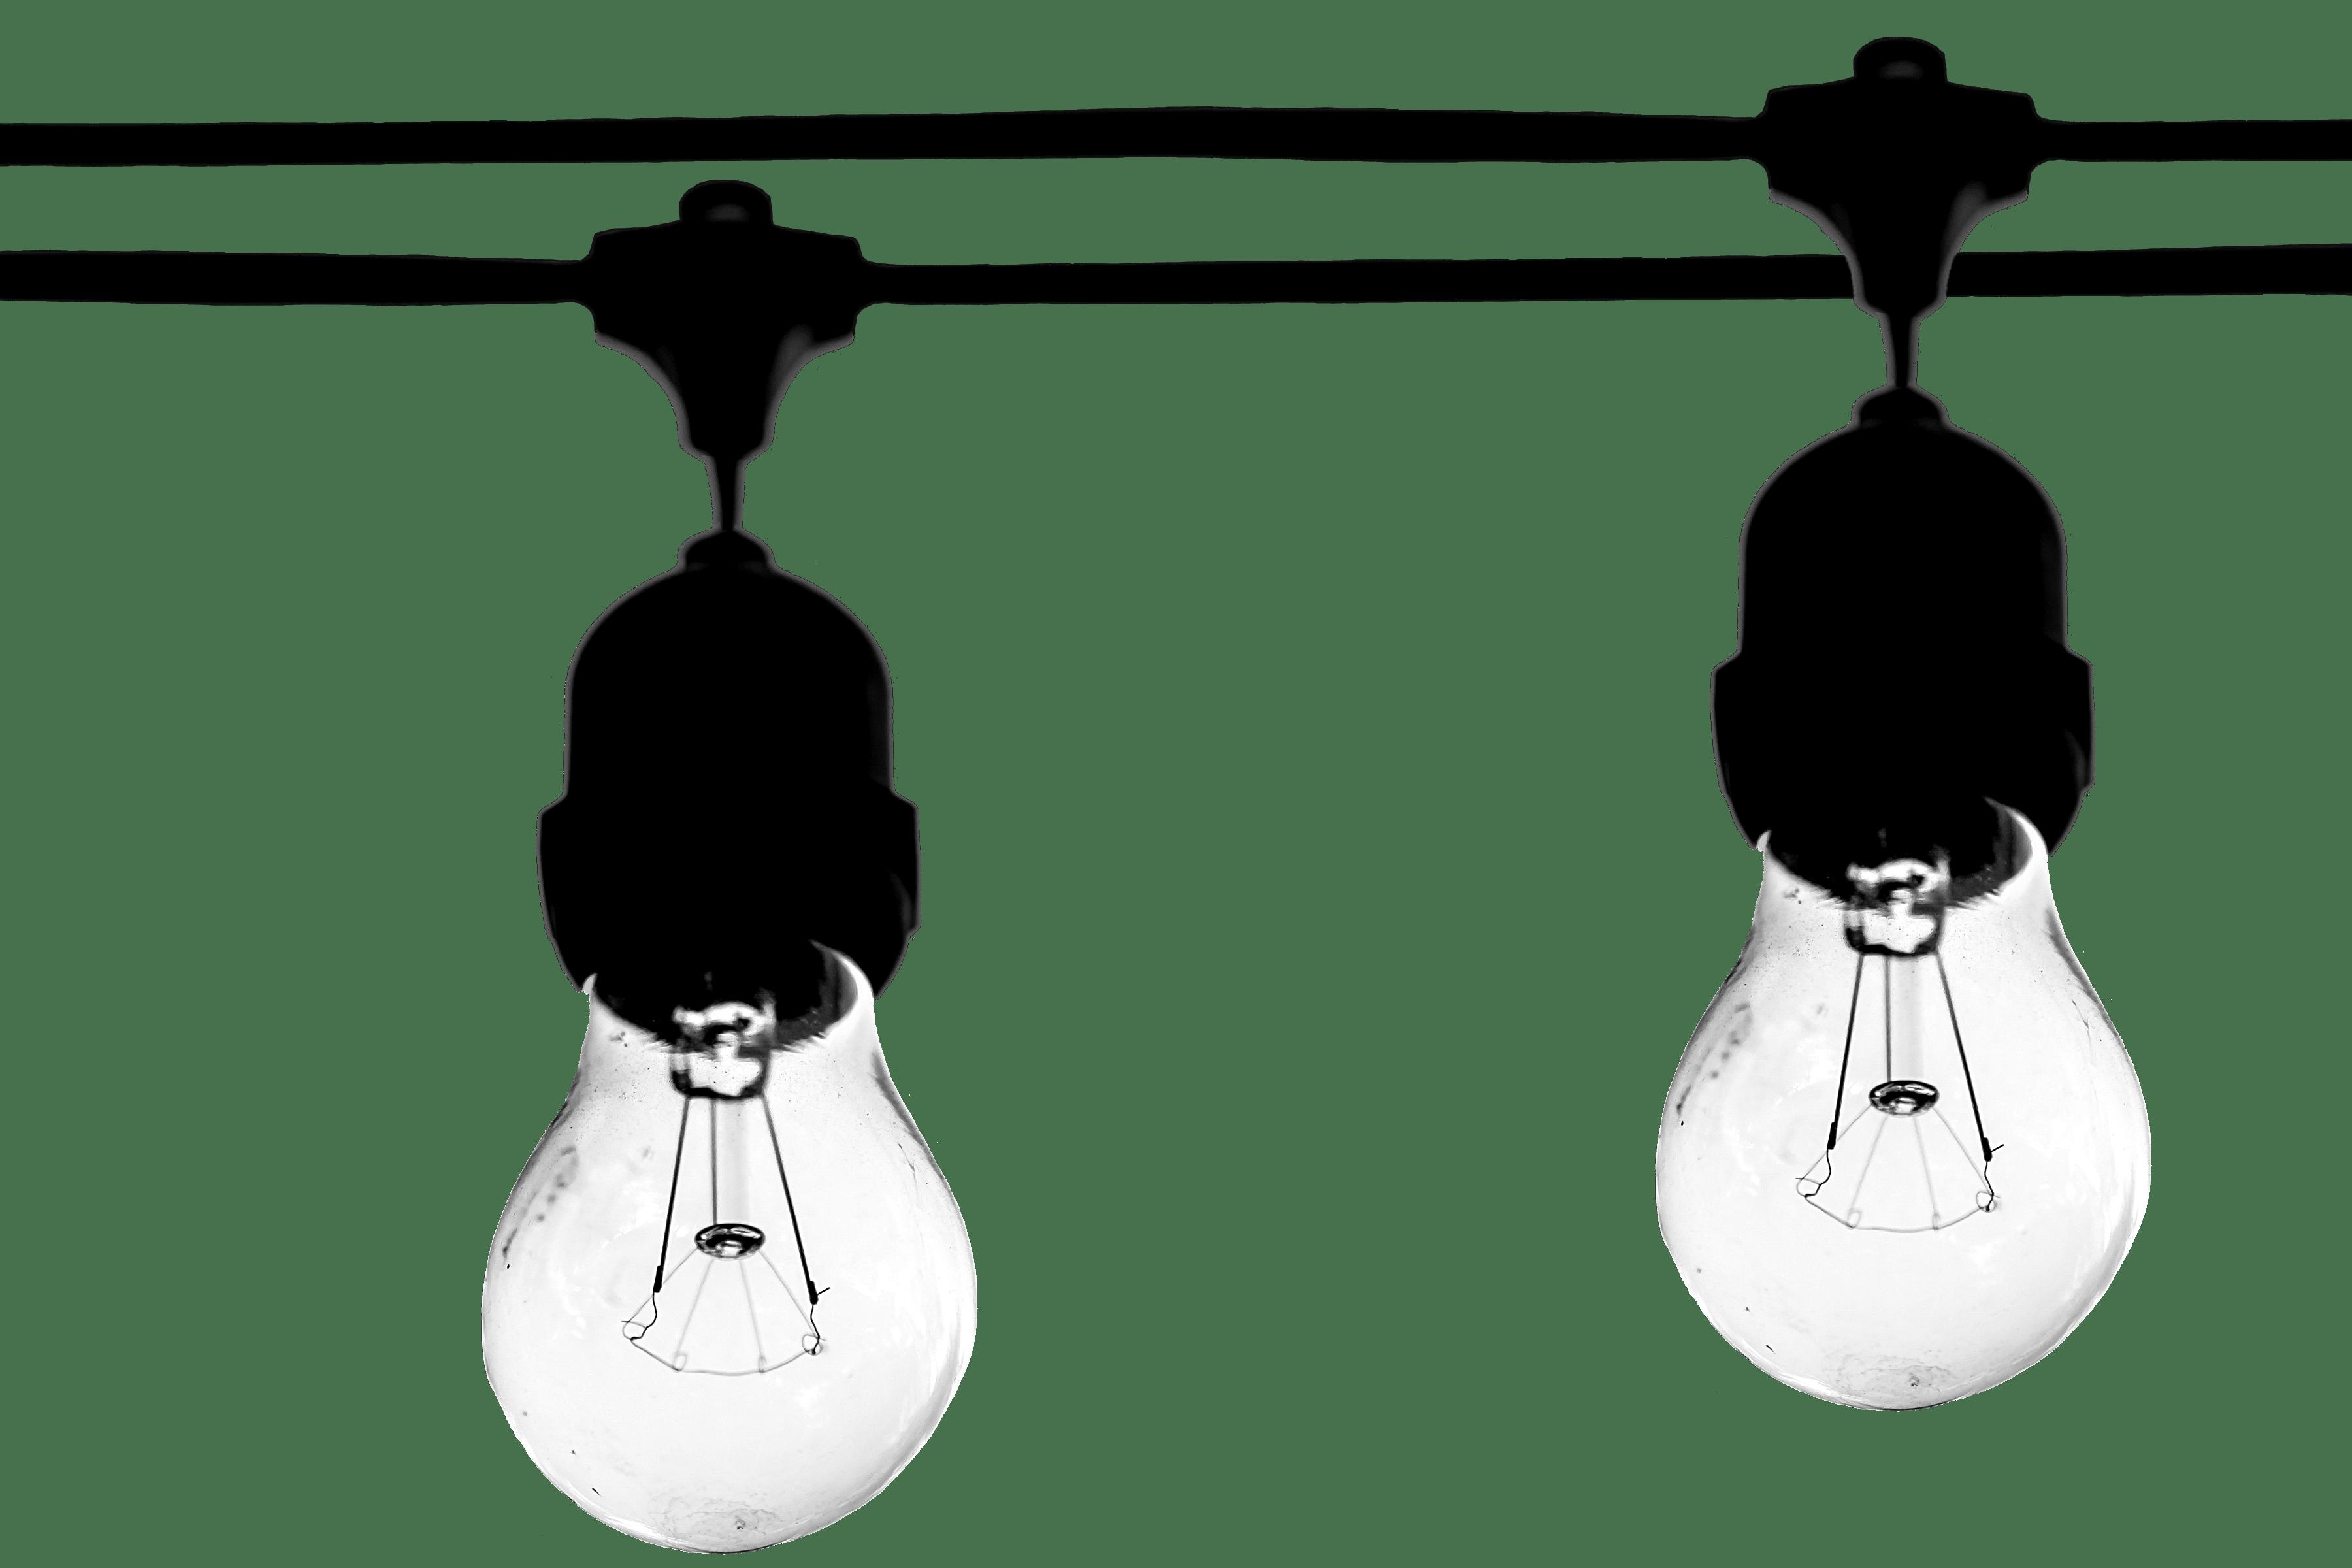 Two Lighted Bulbs